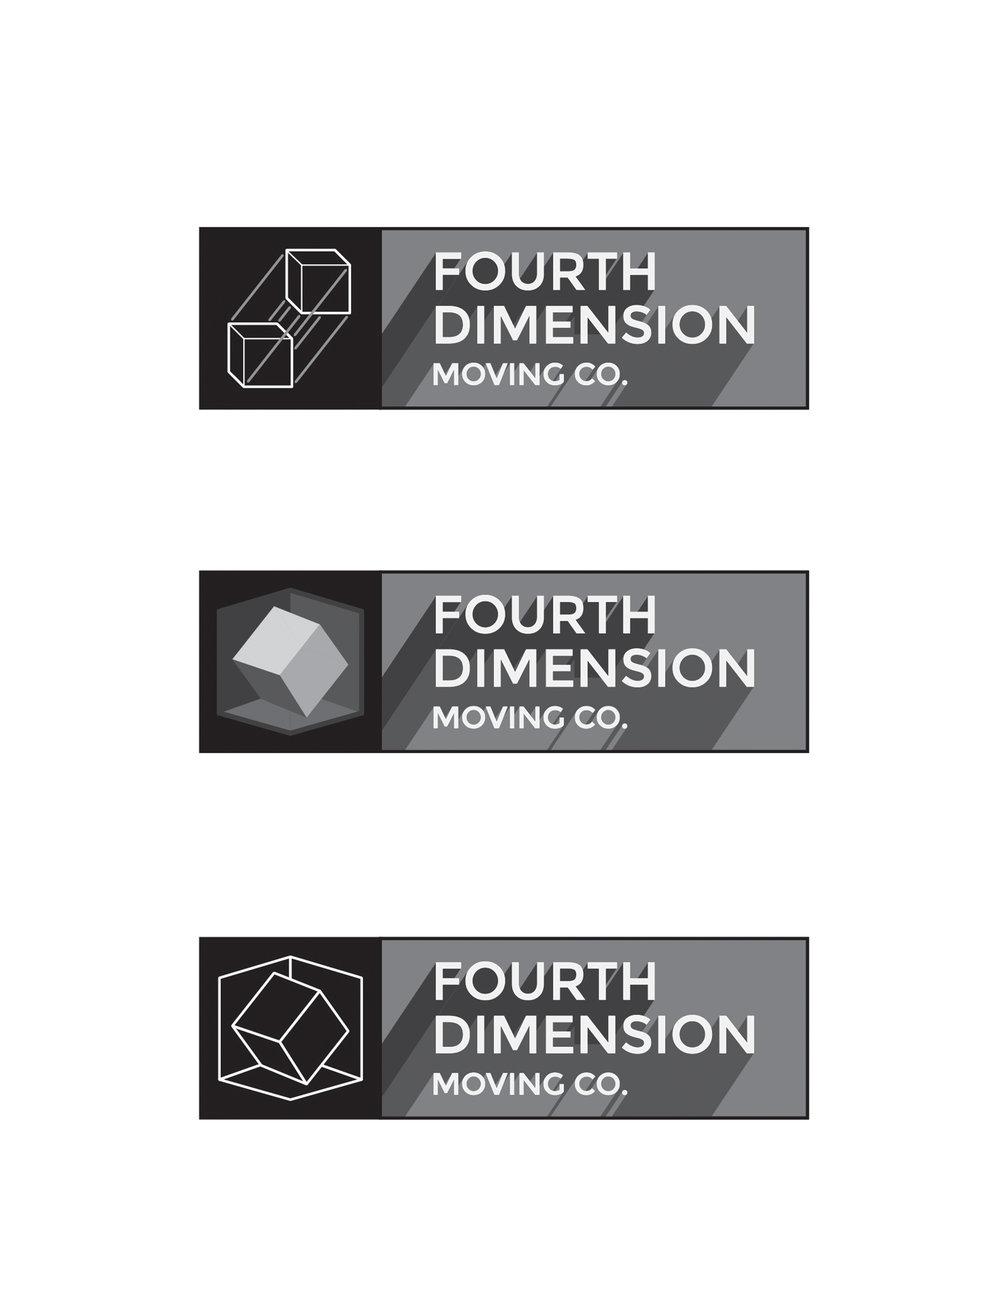 Design_Work_3.jpg